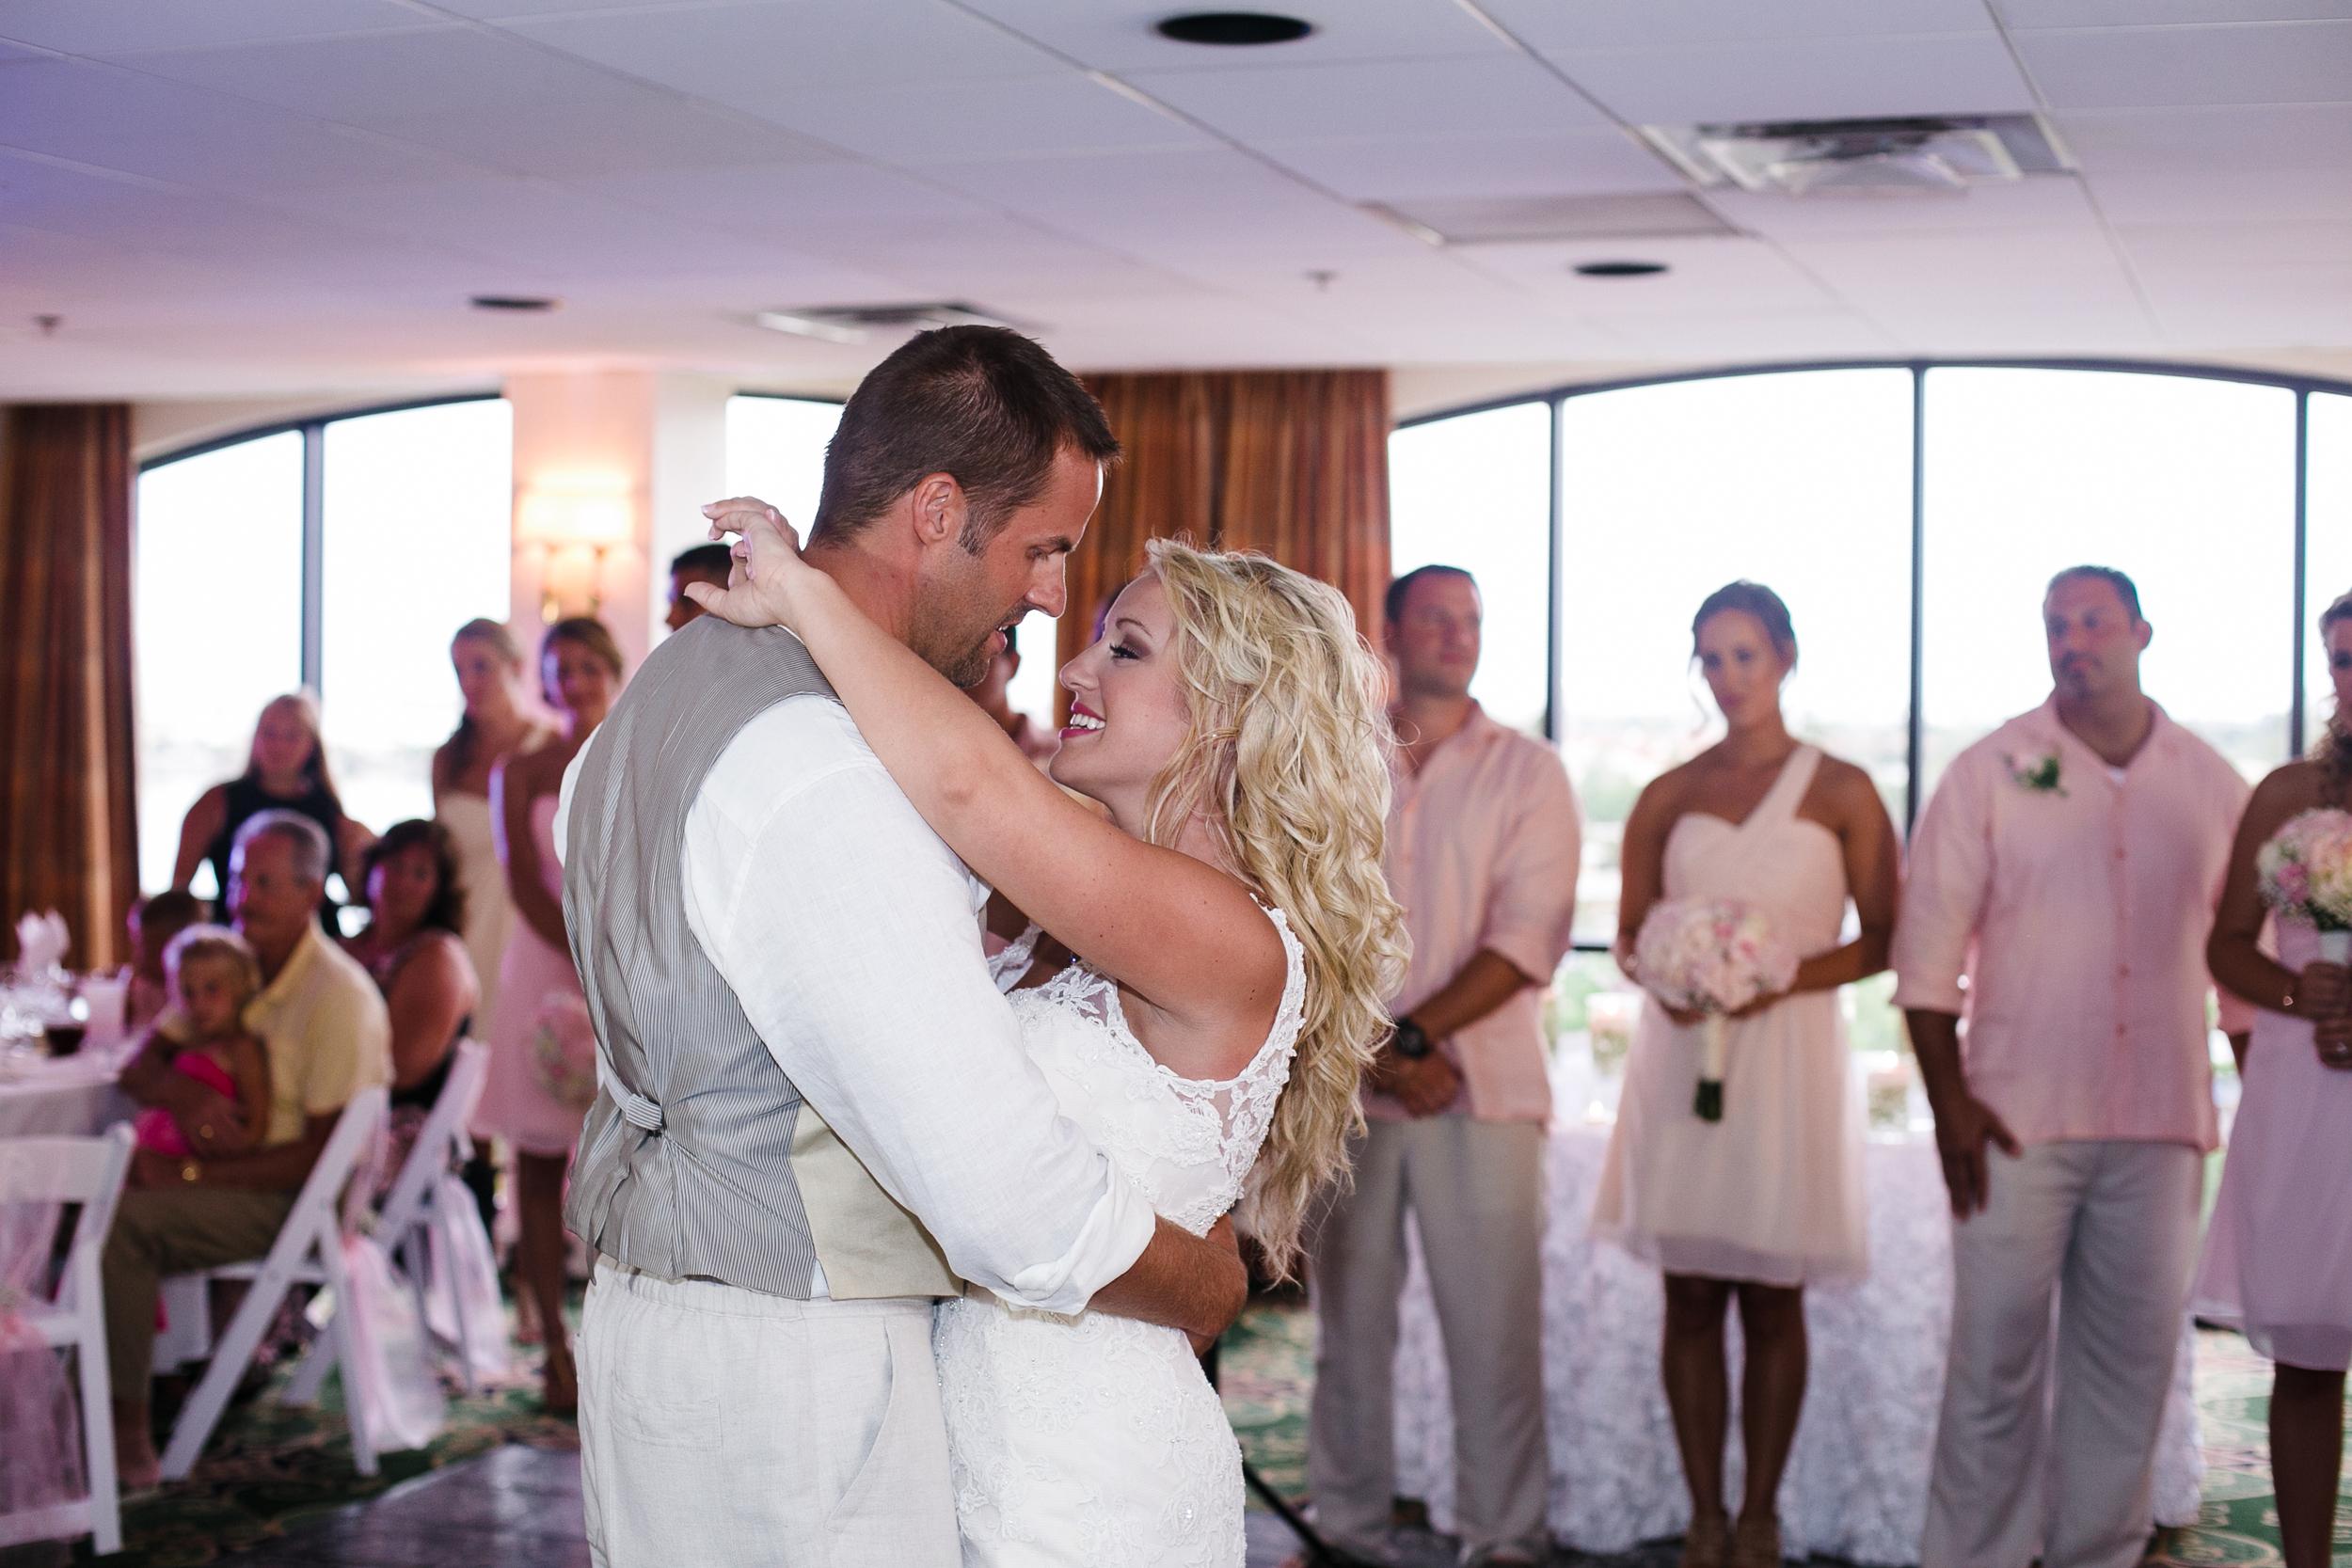 Harris wedding (17 of 72).JPG